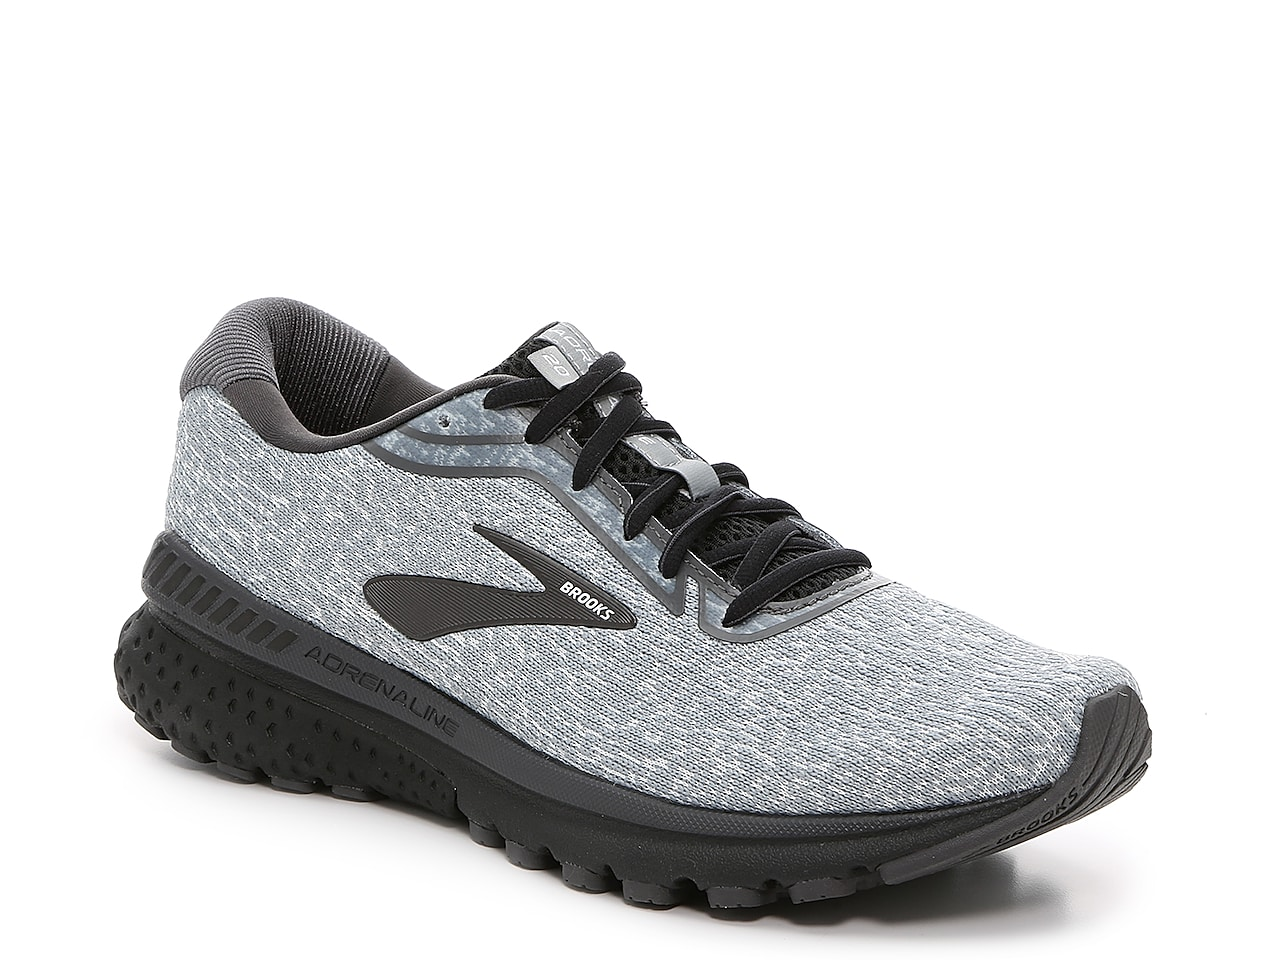 Brooks Adrenaline GTS 20 Running Shoe - Men's